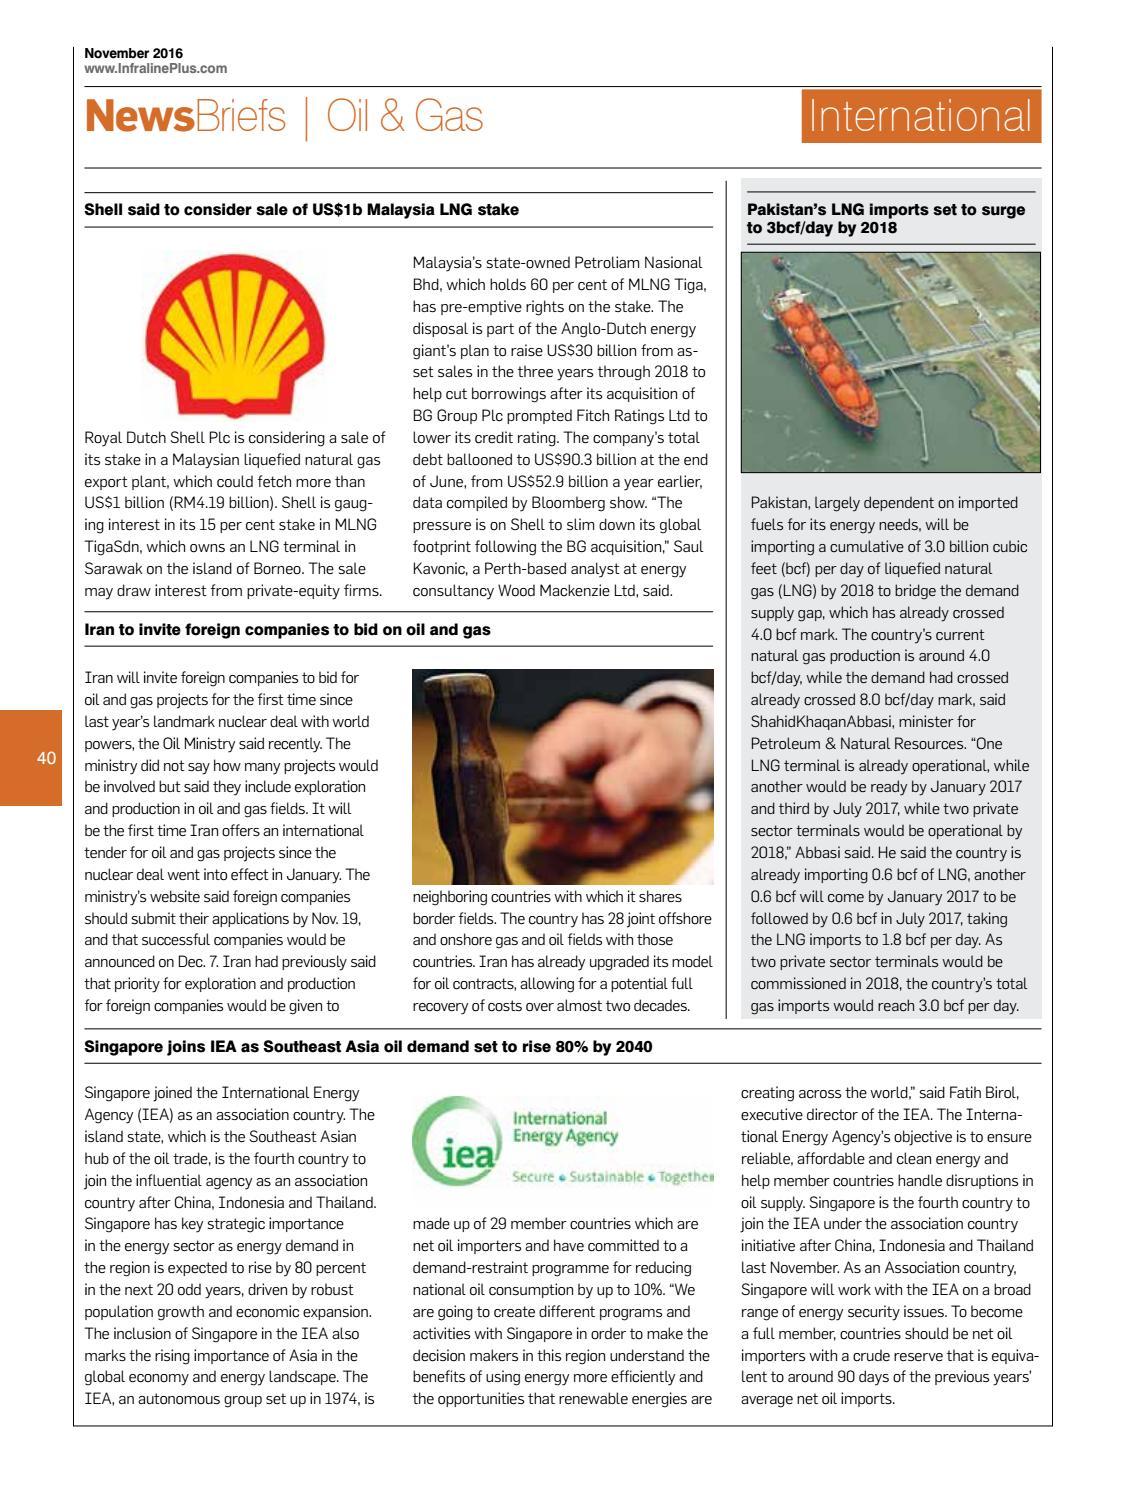 Summary: Shell (Royal Dutch Shell) (A) Outperform